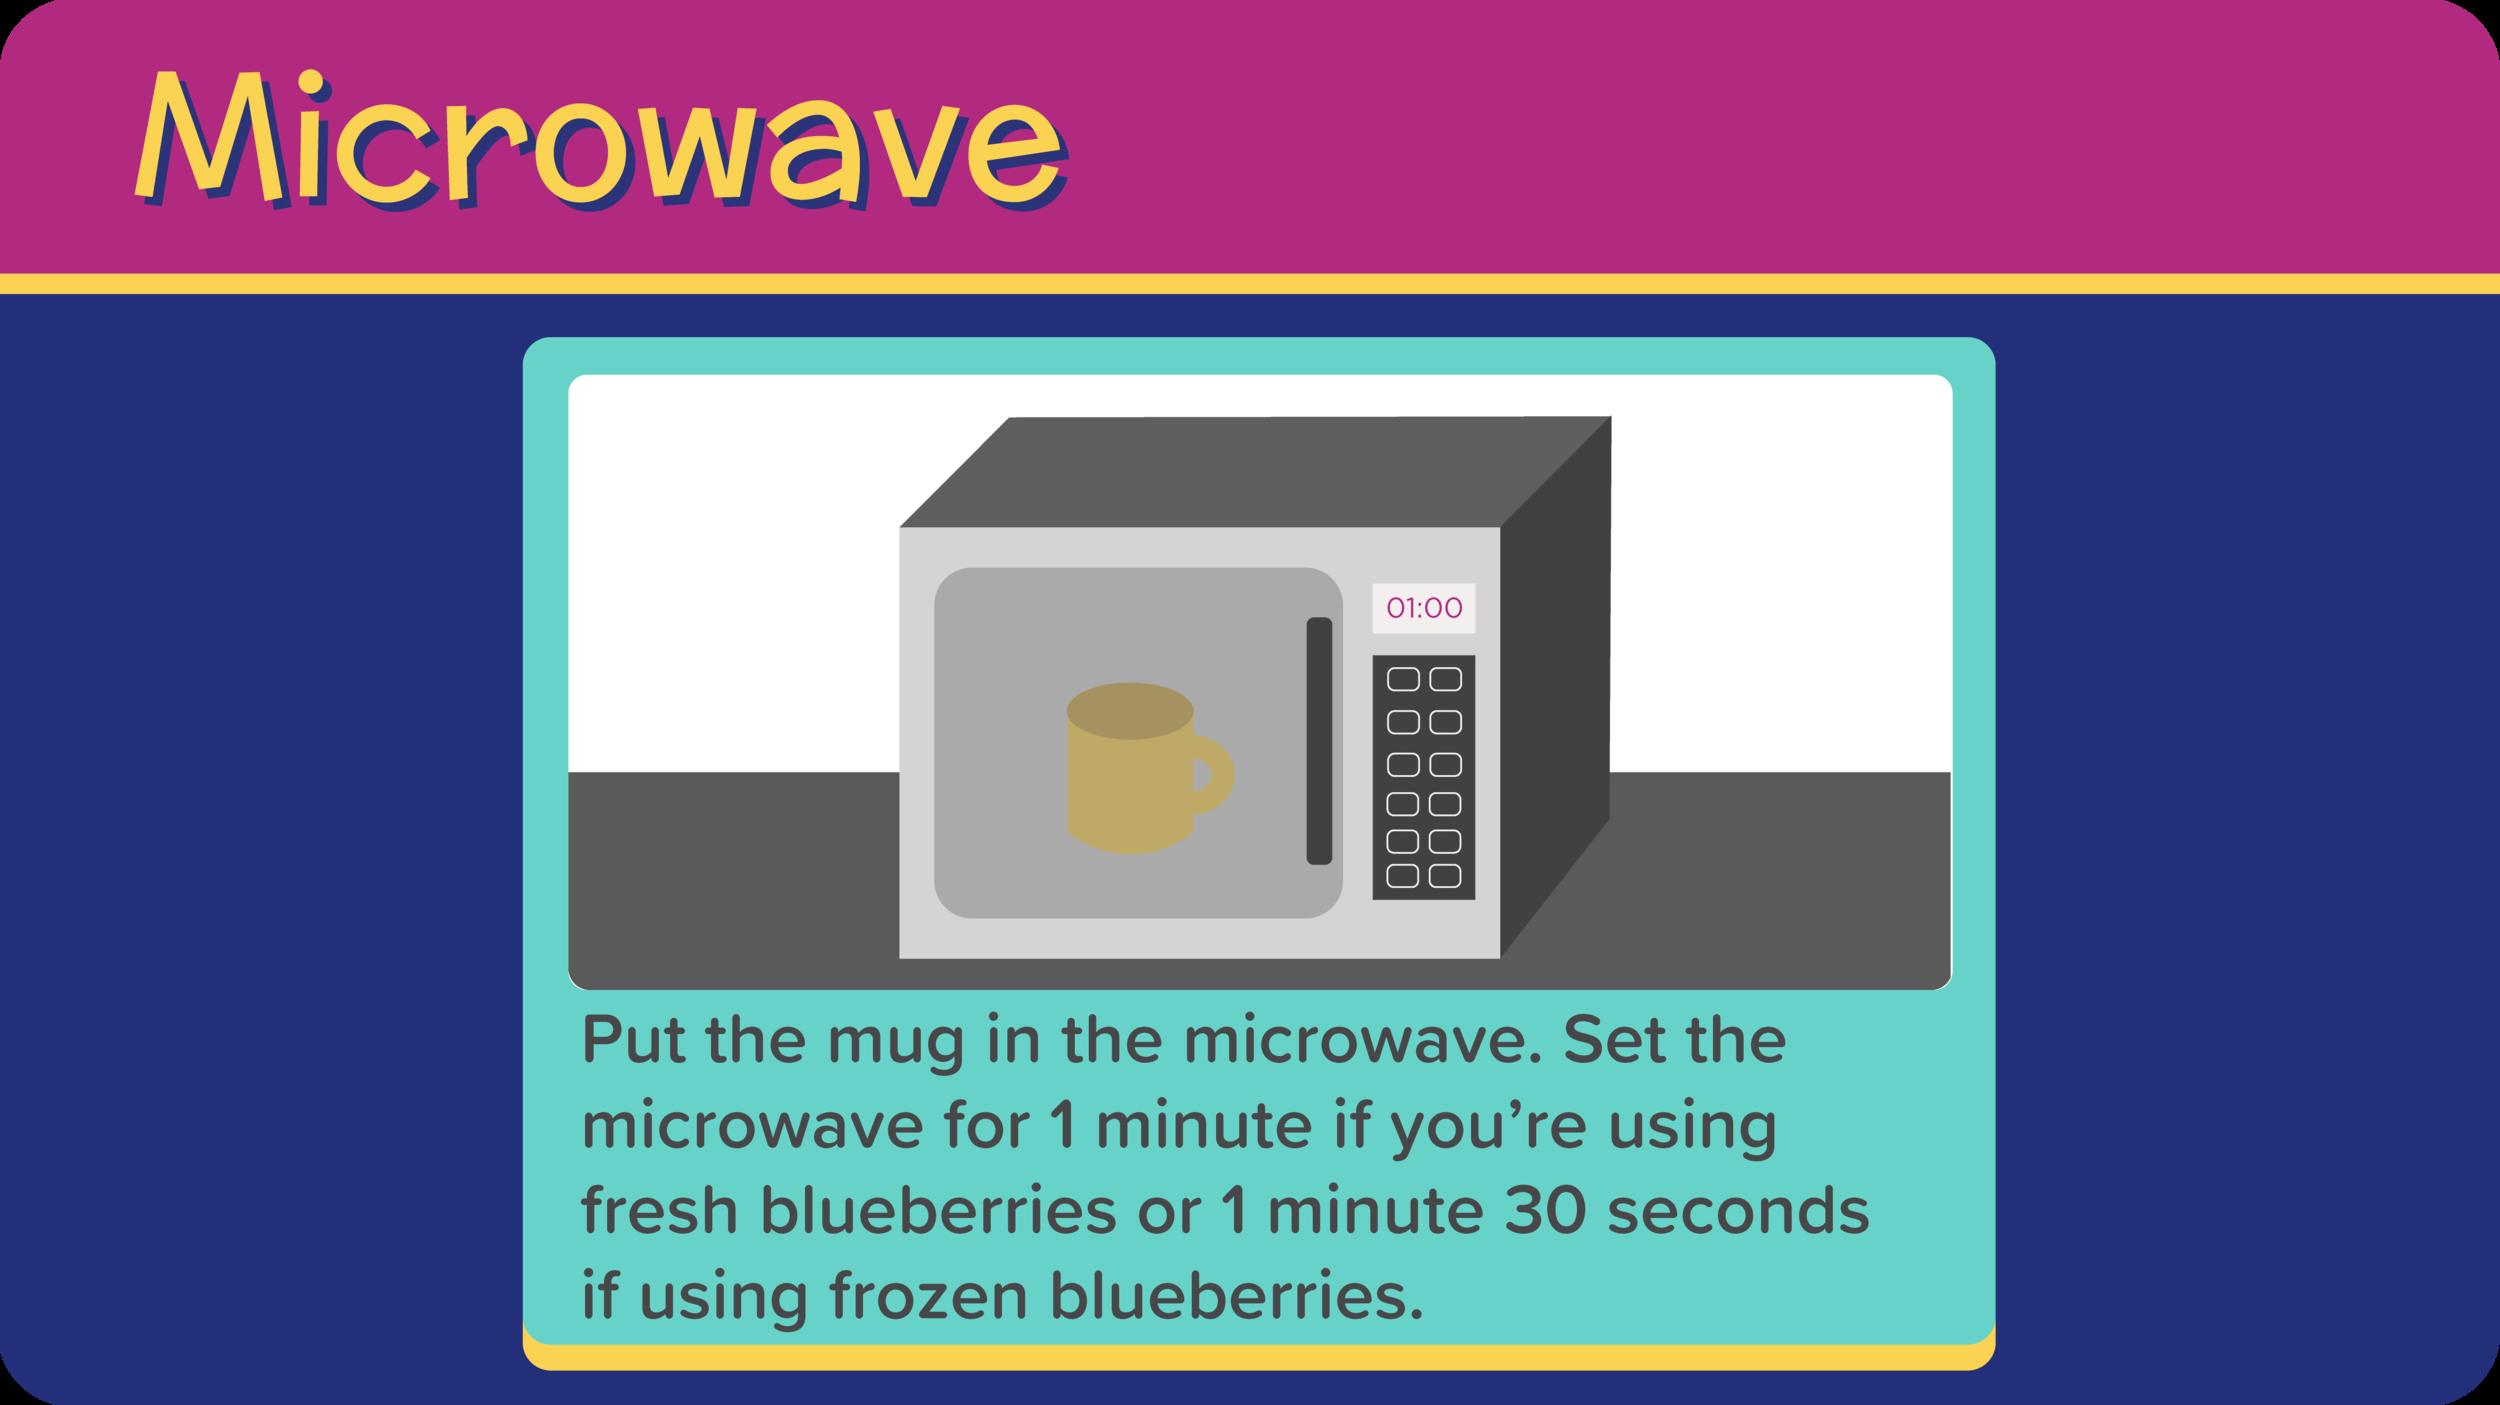 21_BlueberryMugMuffin_microwave-01.png